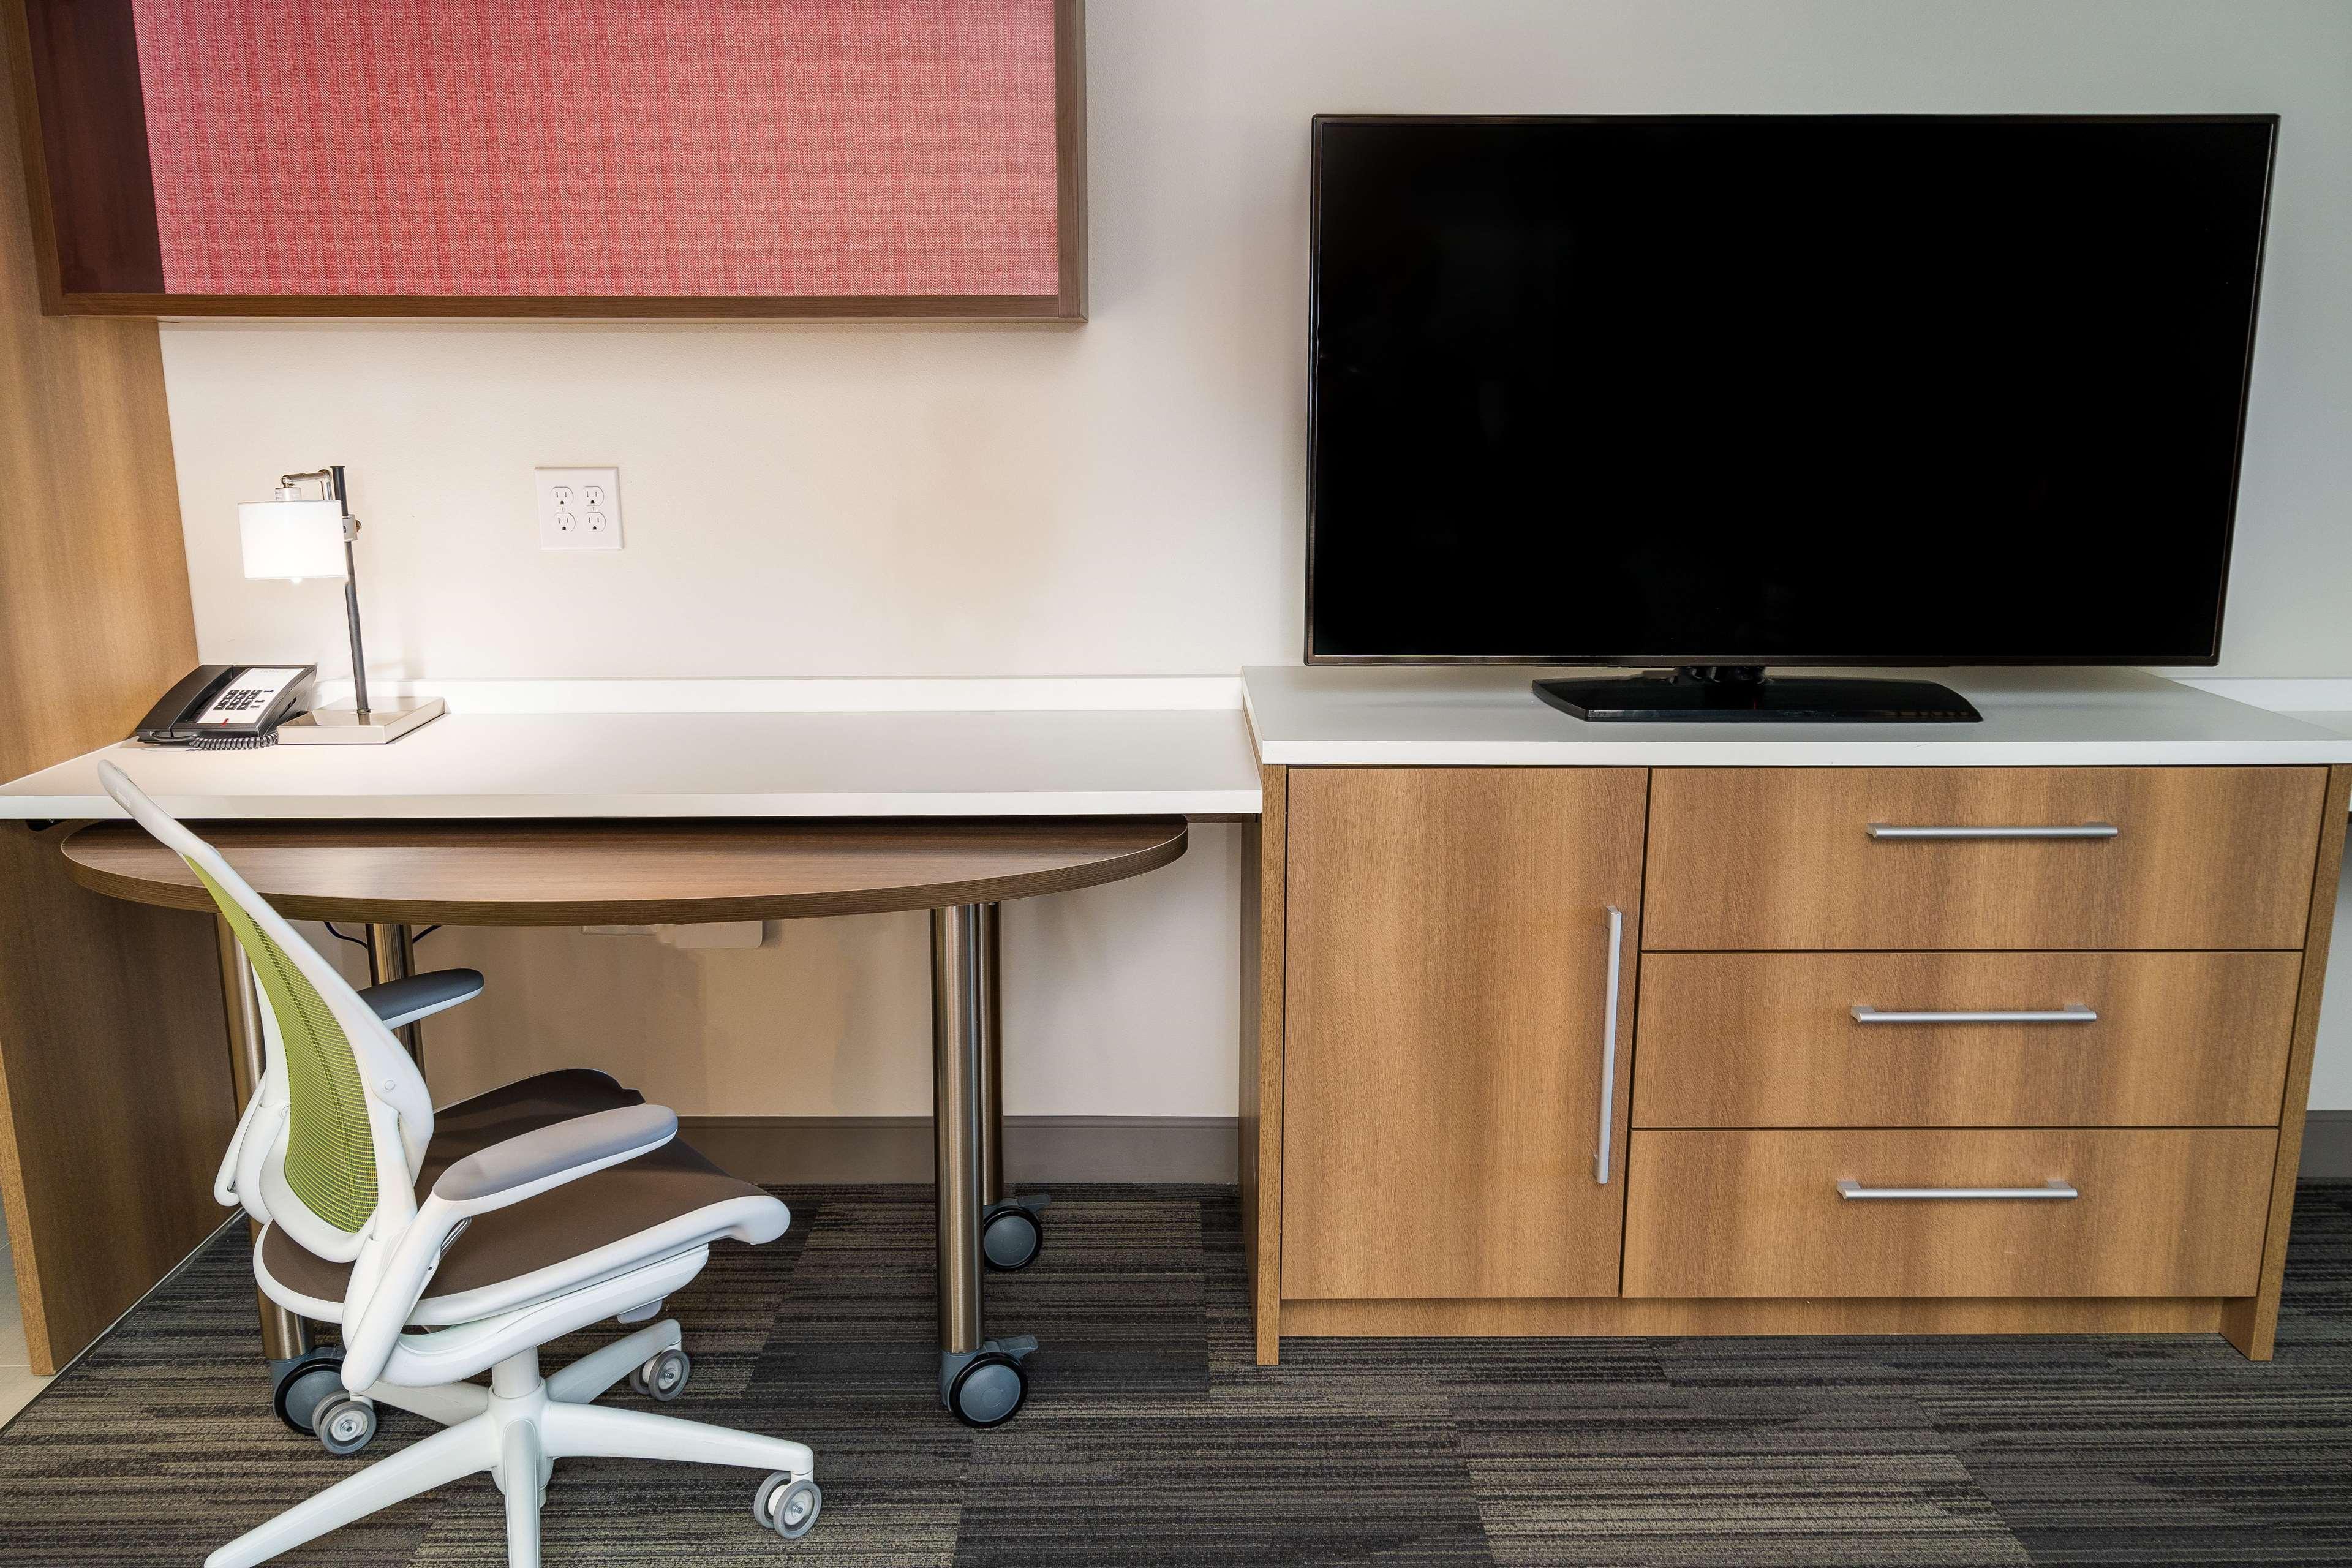 Home2 Suites By Hilton San Antonio At The Rim San Antonio